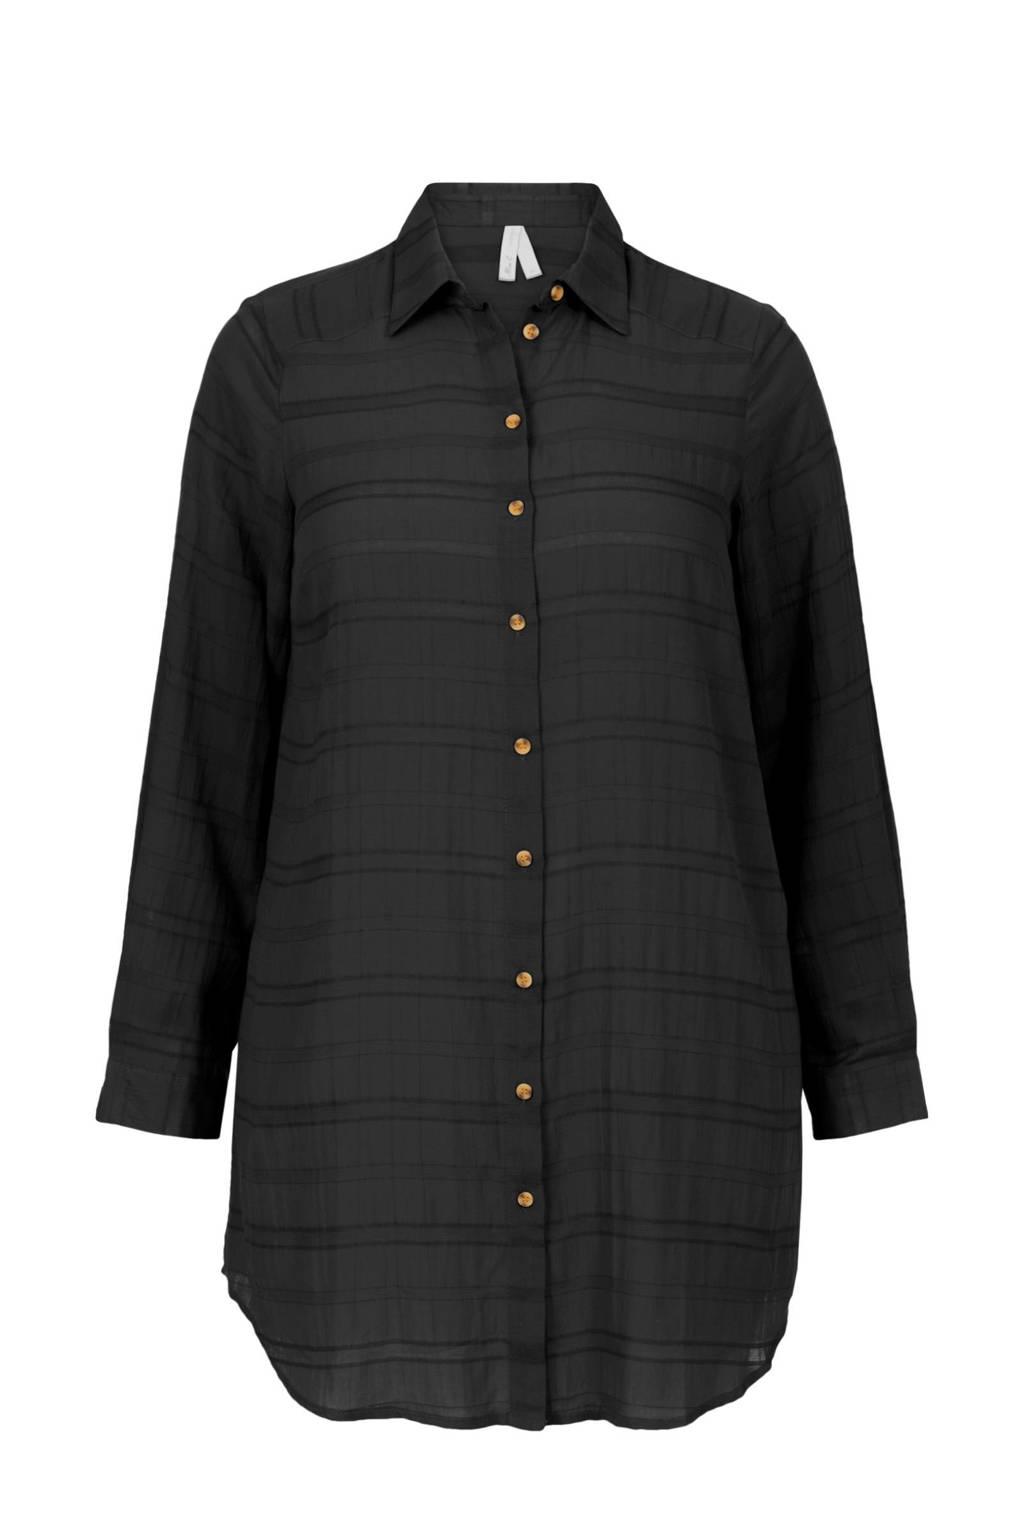 Miss Etam Plus gestreepte blouse zwart, Zwart